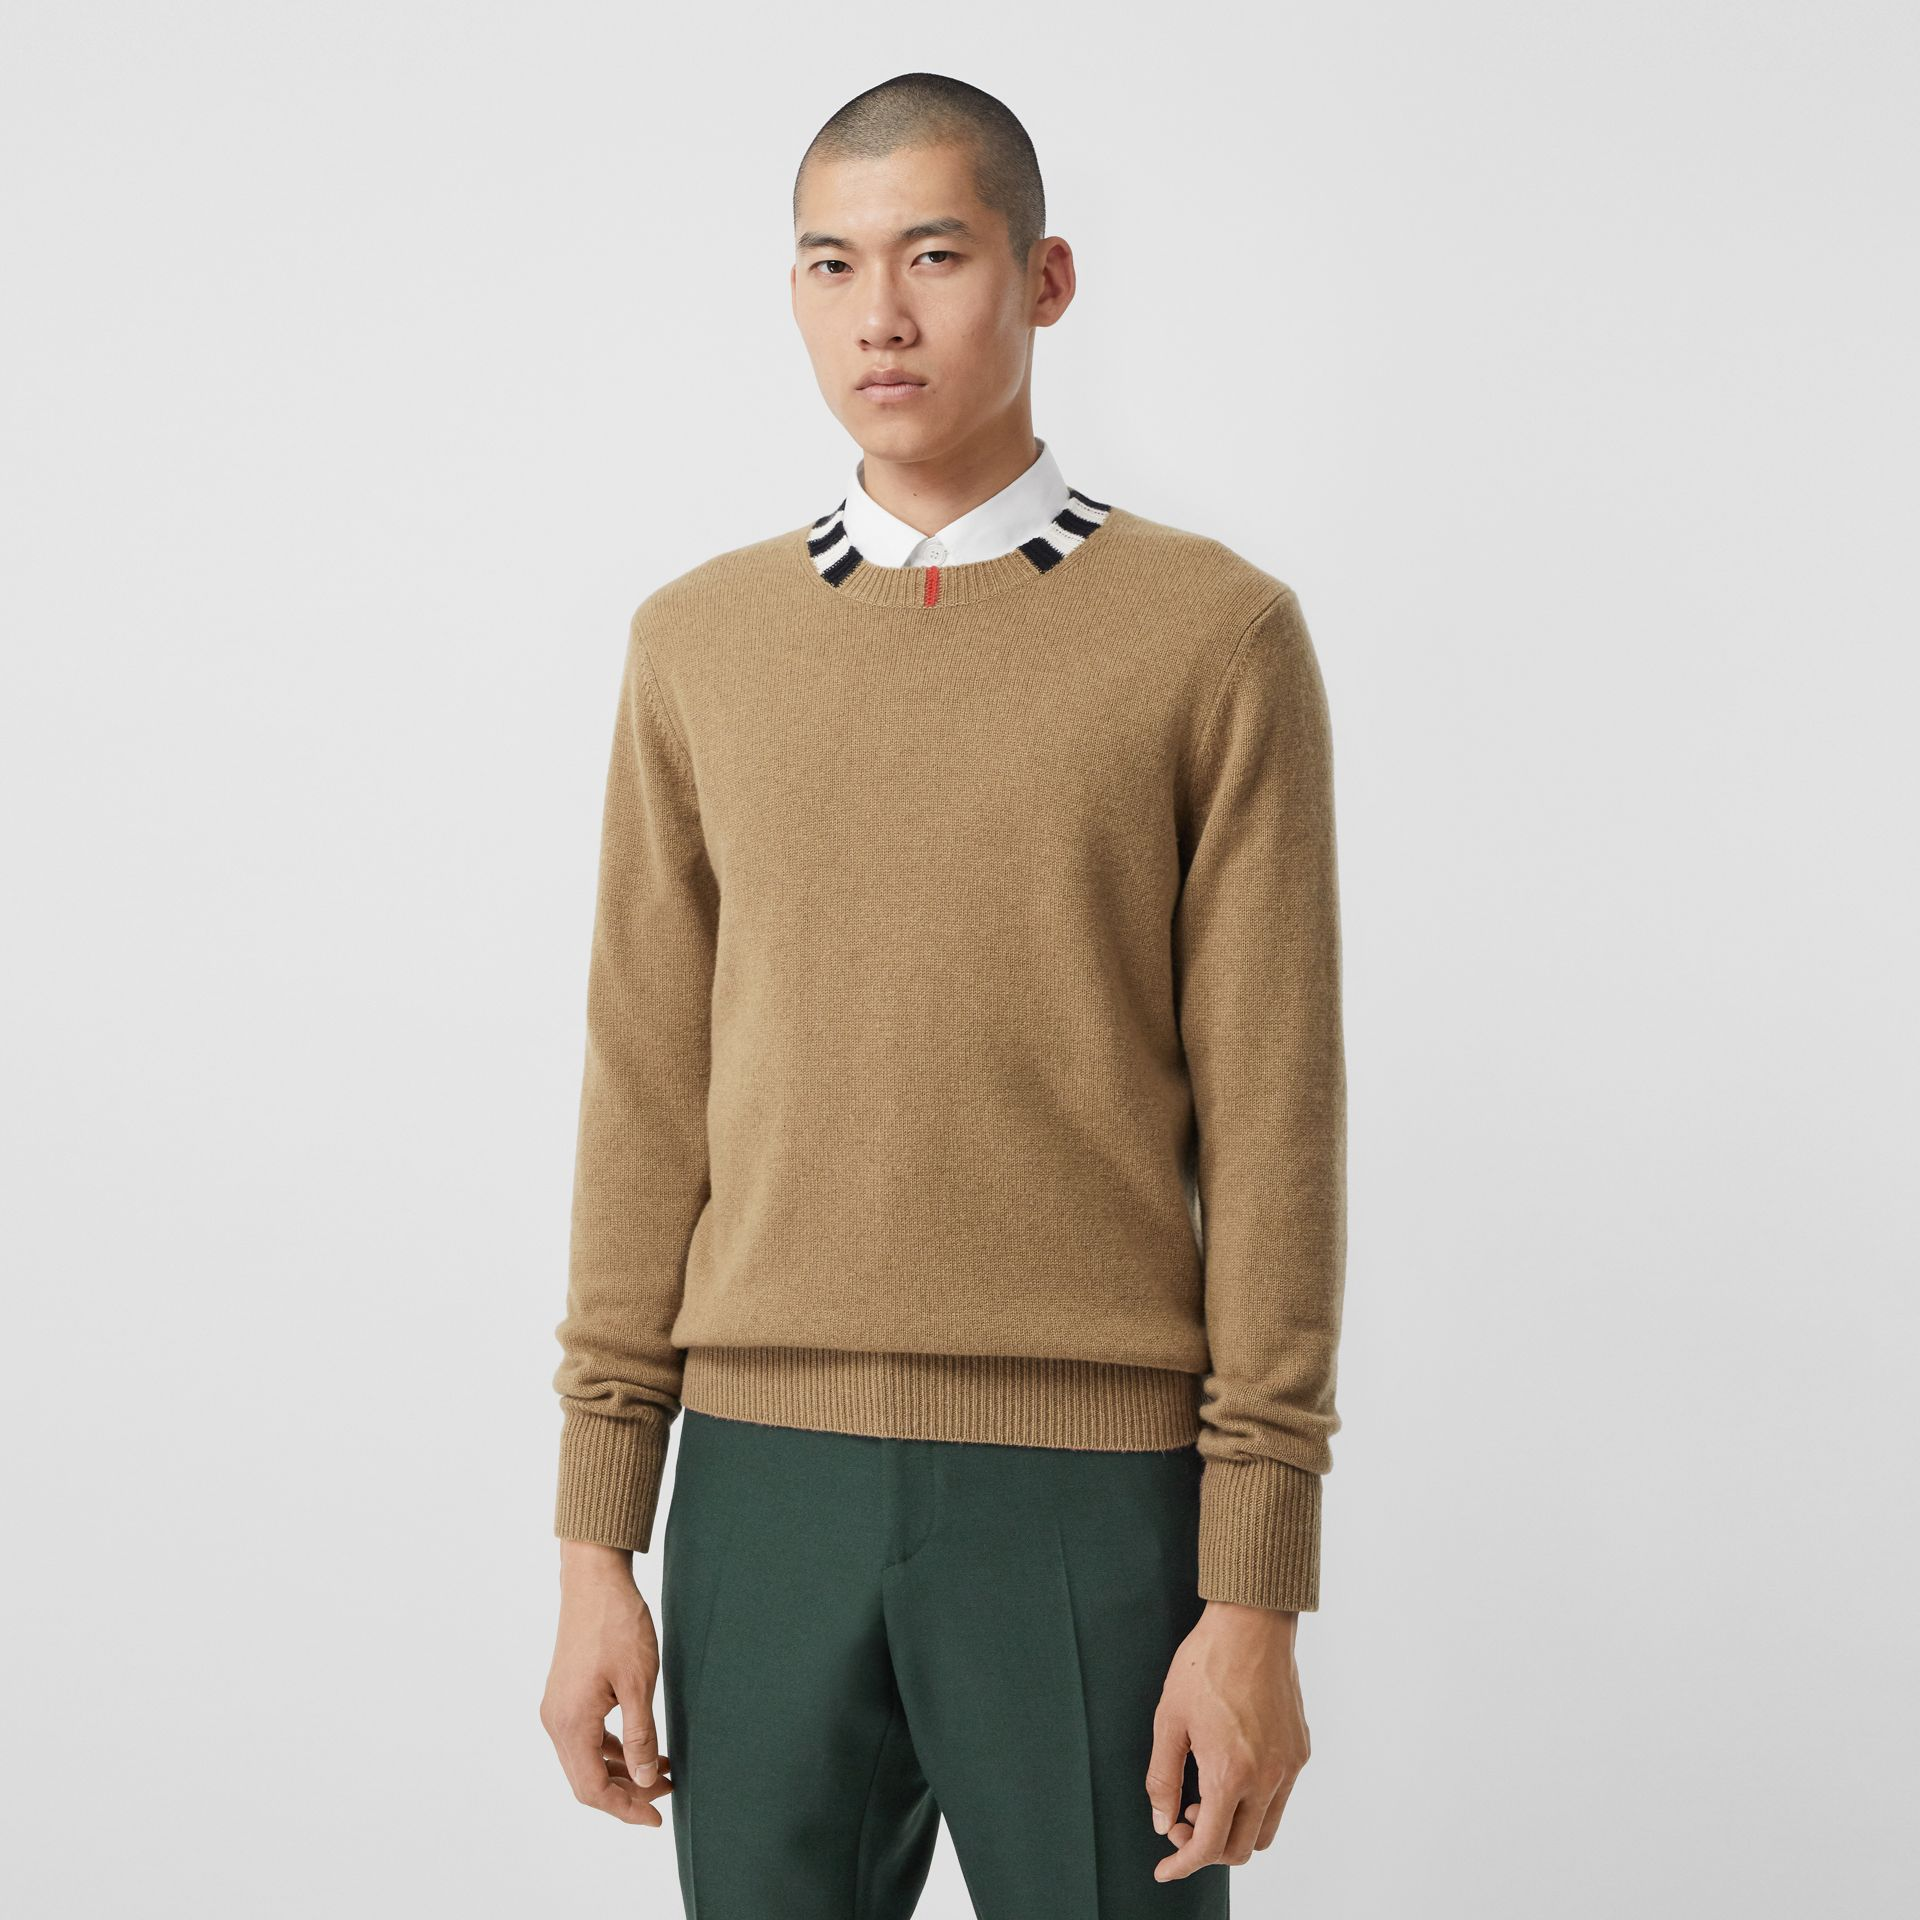 Icon Stripe Trim Cashmere Sweater in Camel - Men | Burberry - gallery image 5